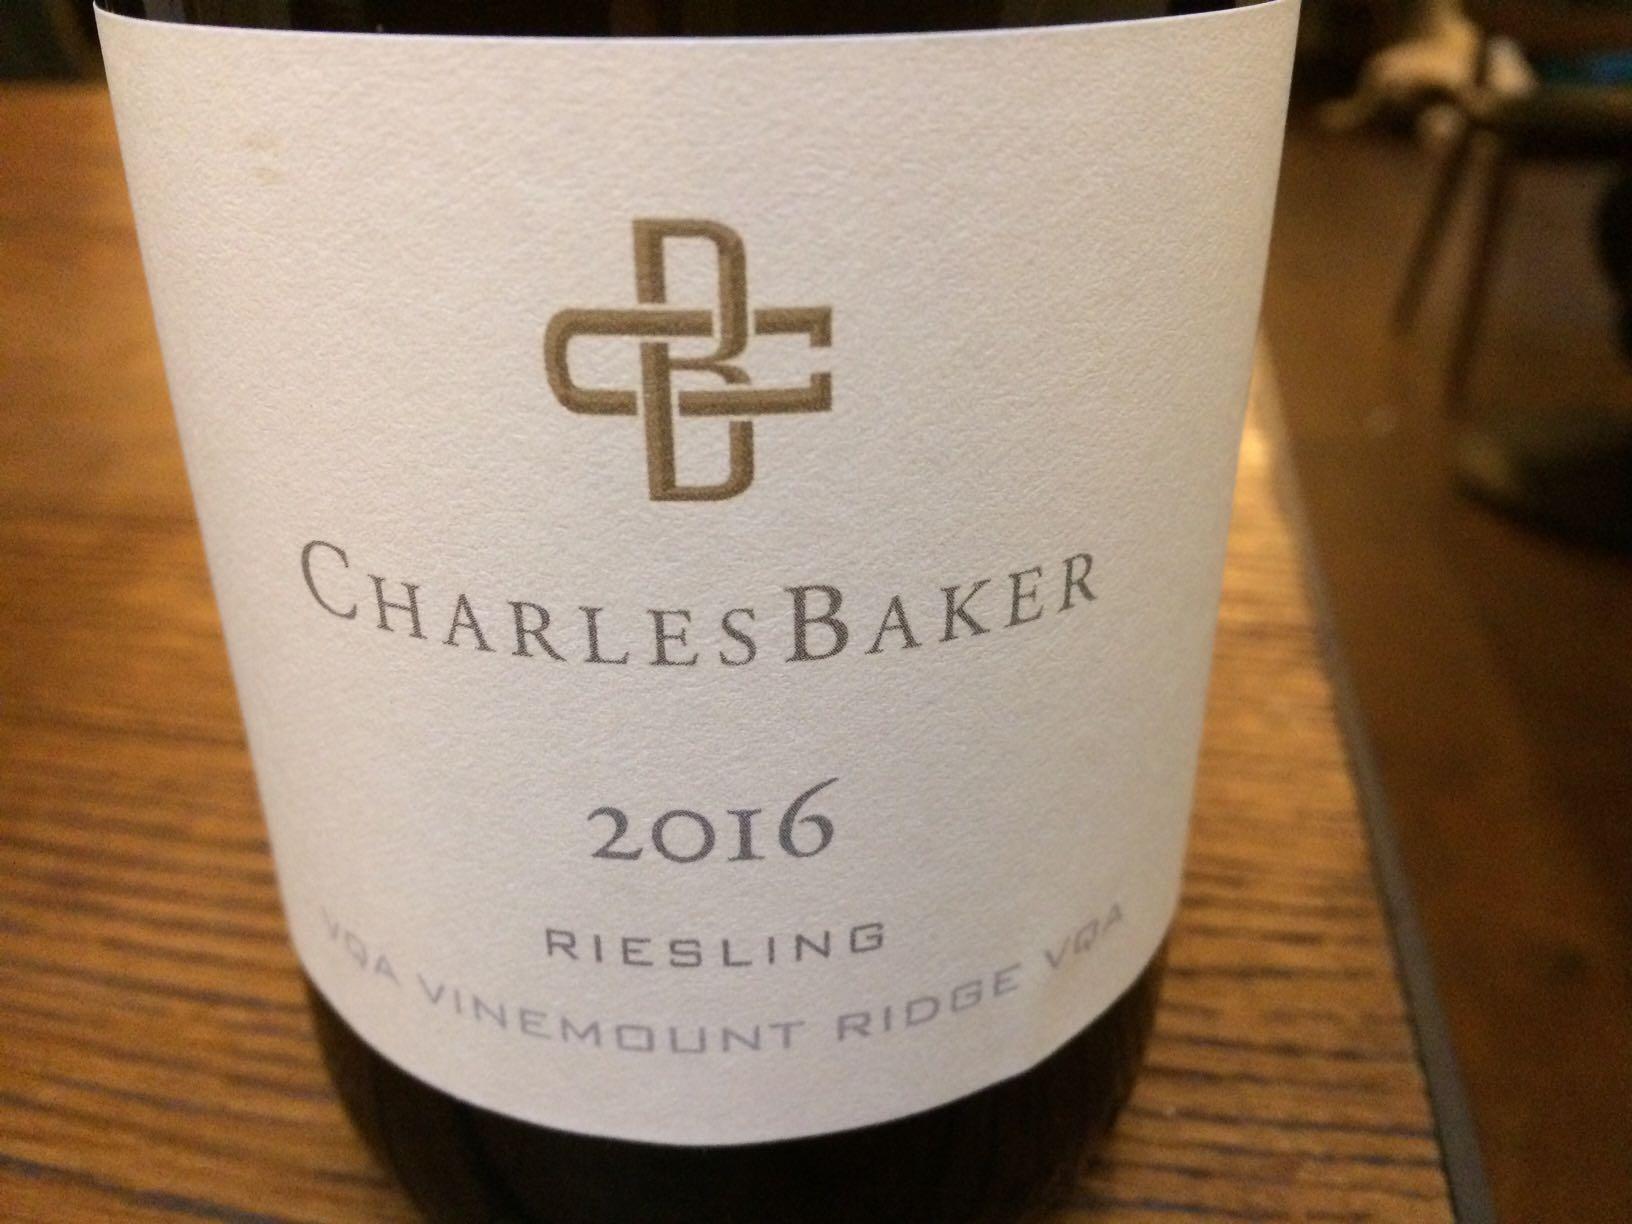 Charles Baker Riesling